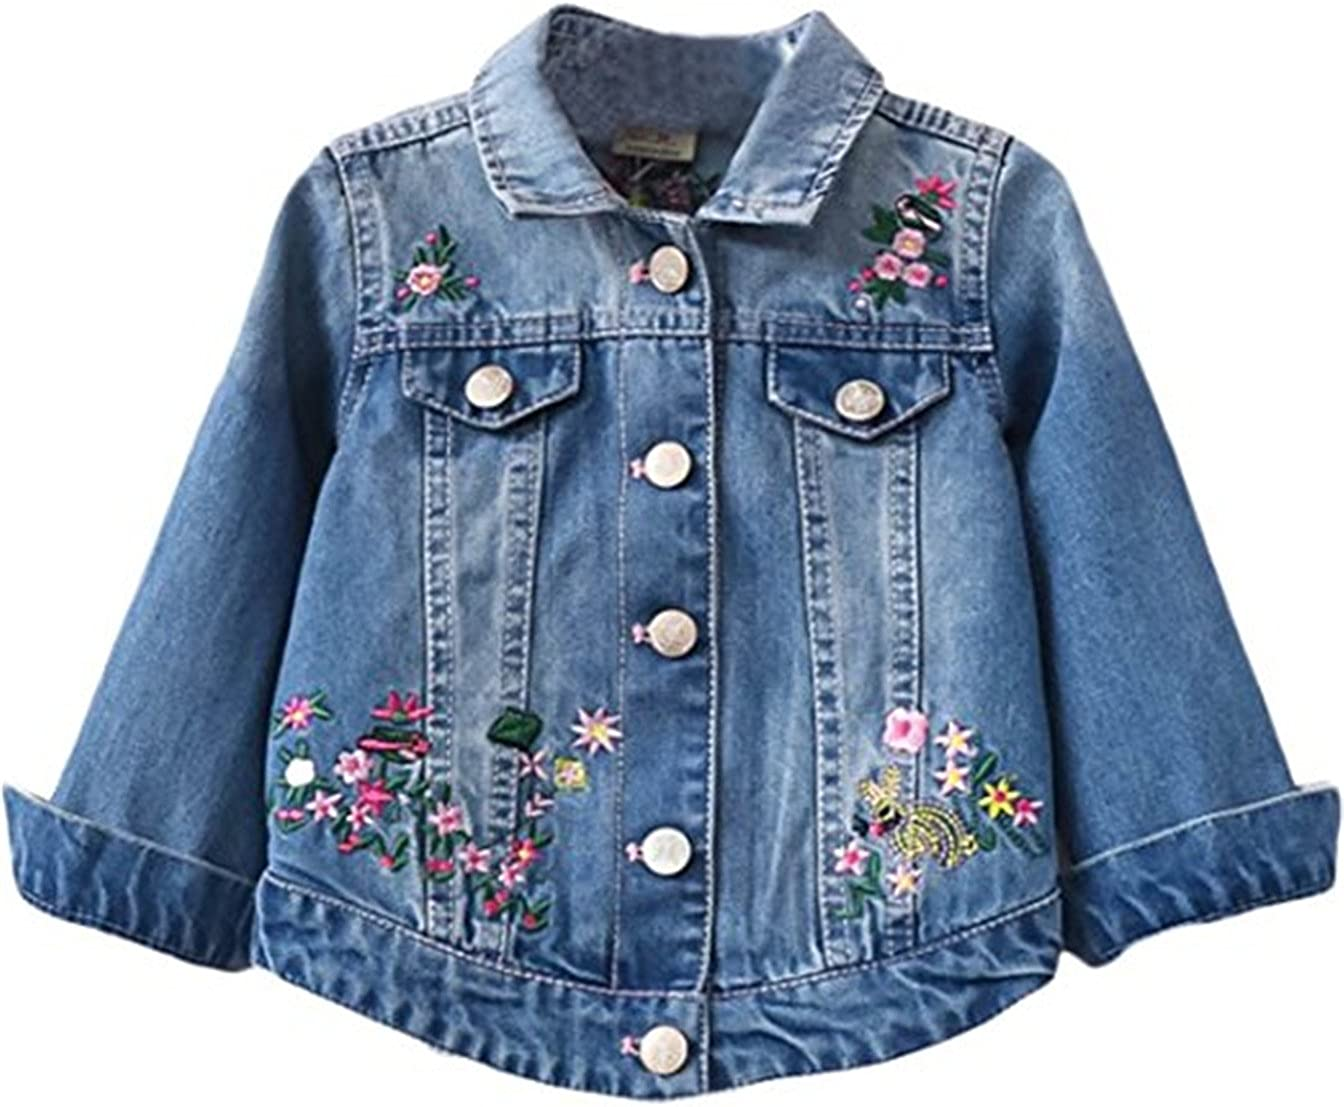 Embroidered Denim Jacket.